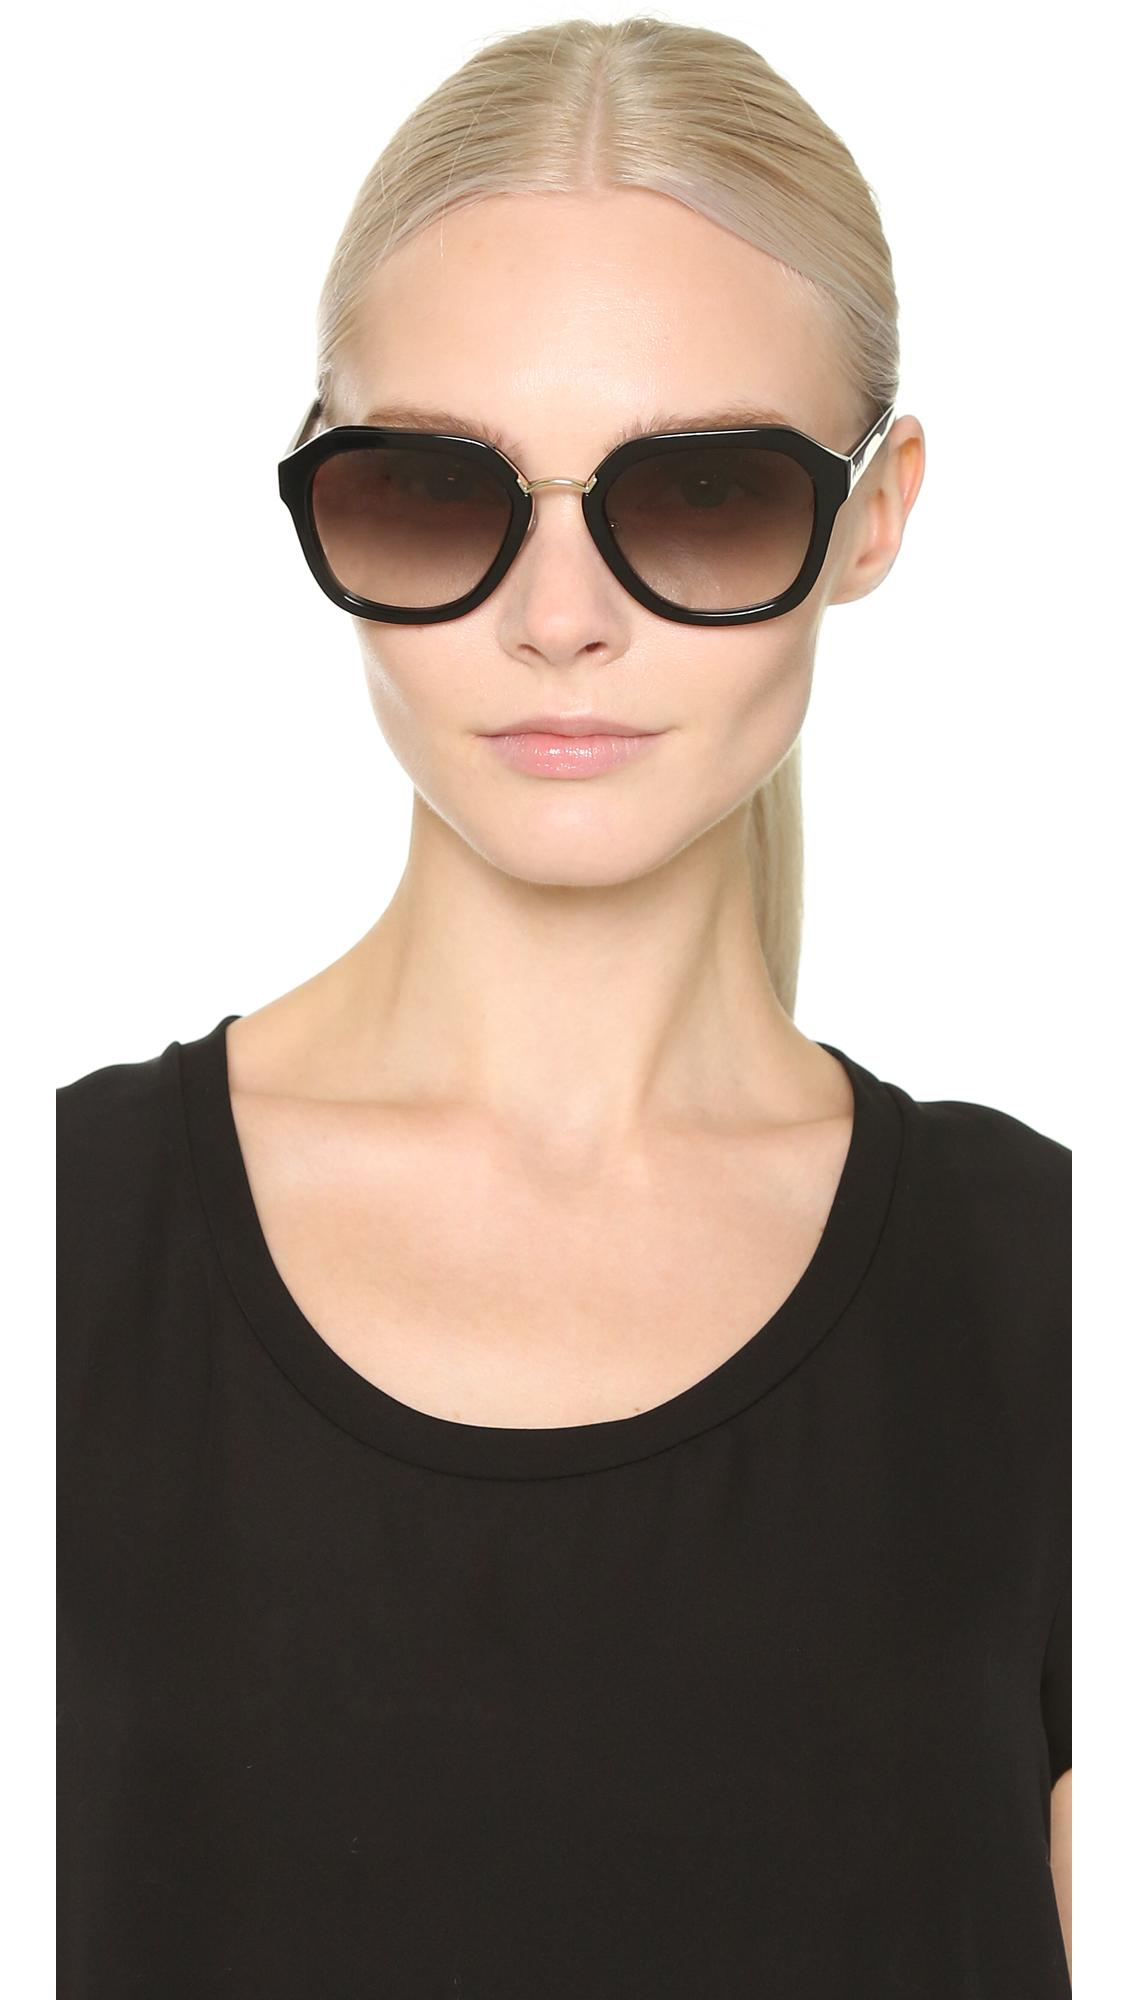 55291ee3b7 order lyst prada metal bridge sunglasses black grey gradient in black 34c5f  41a88